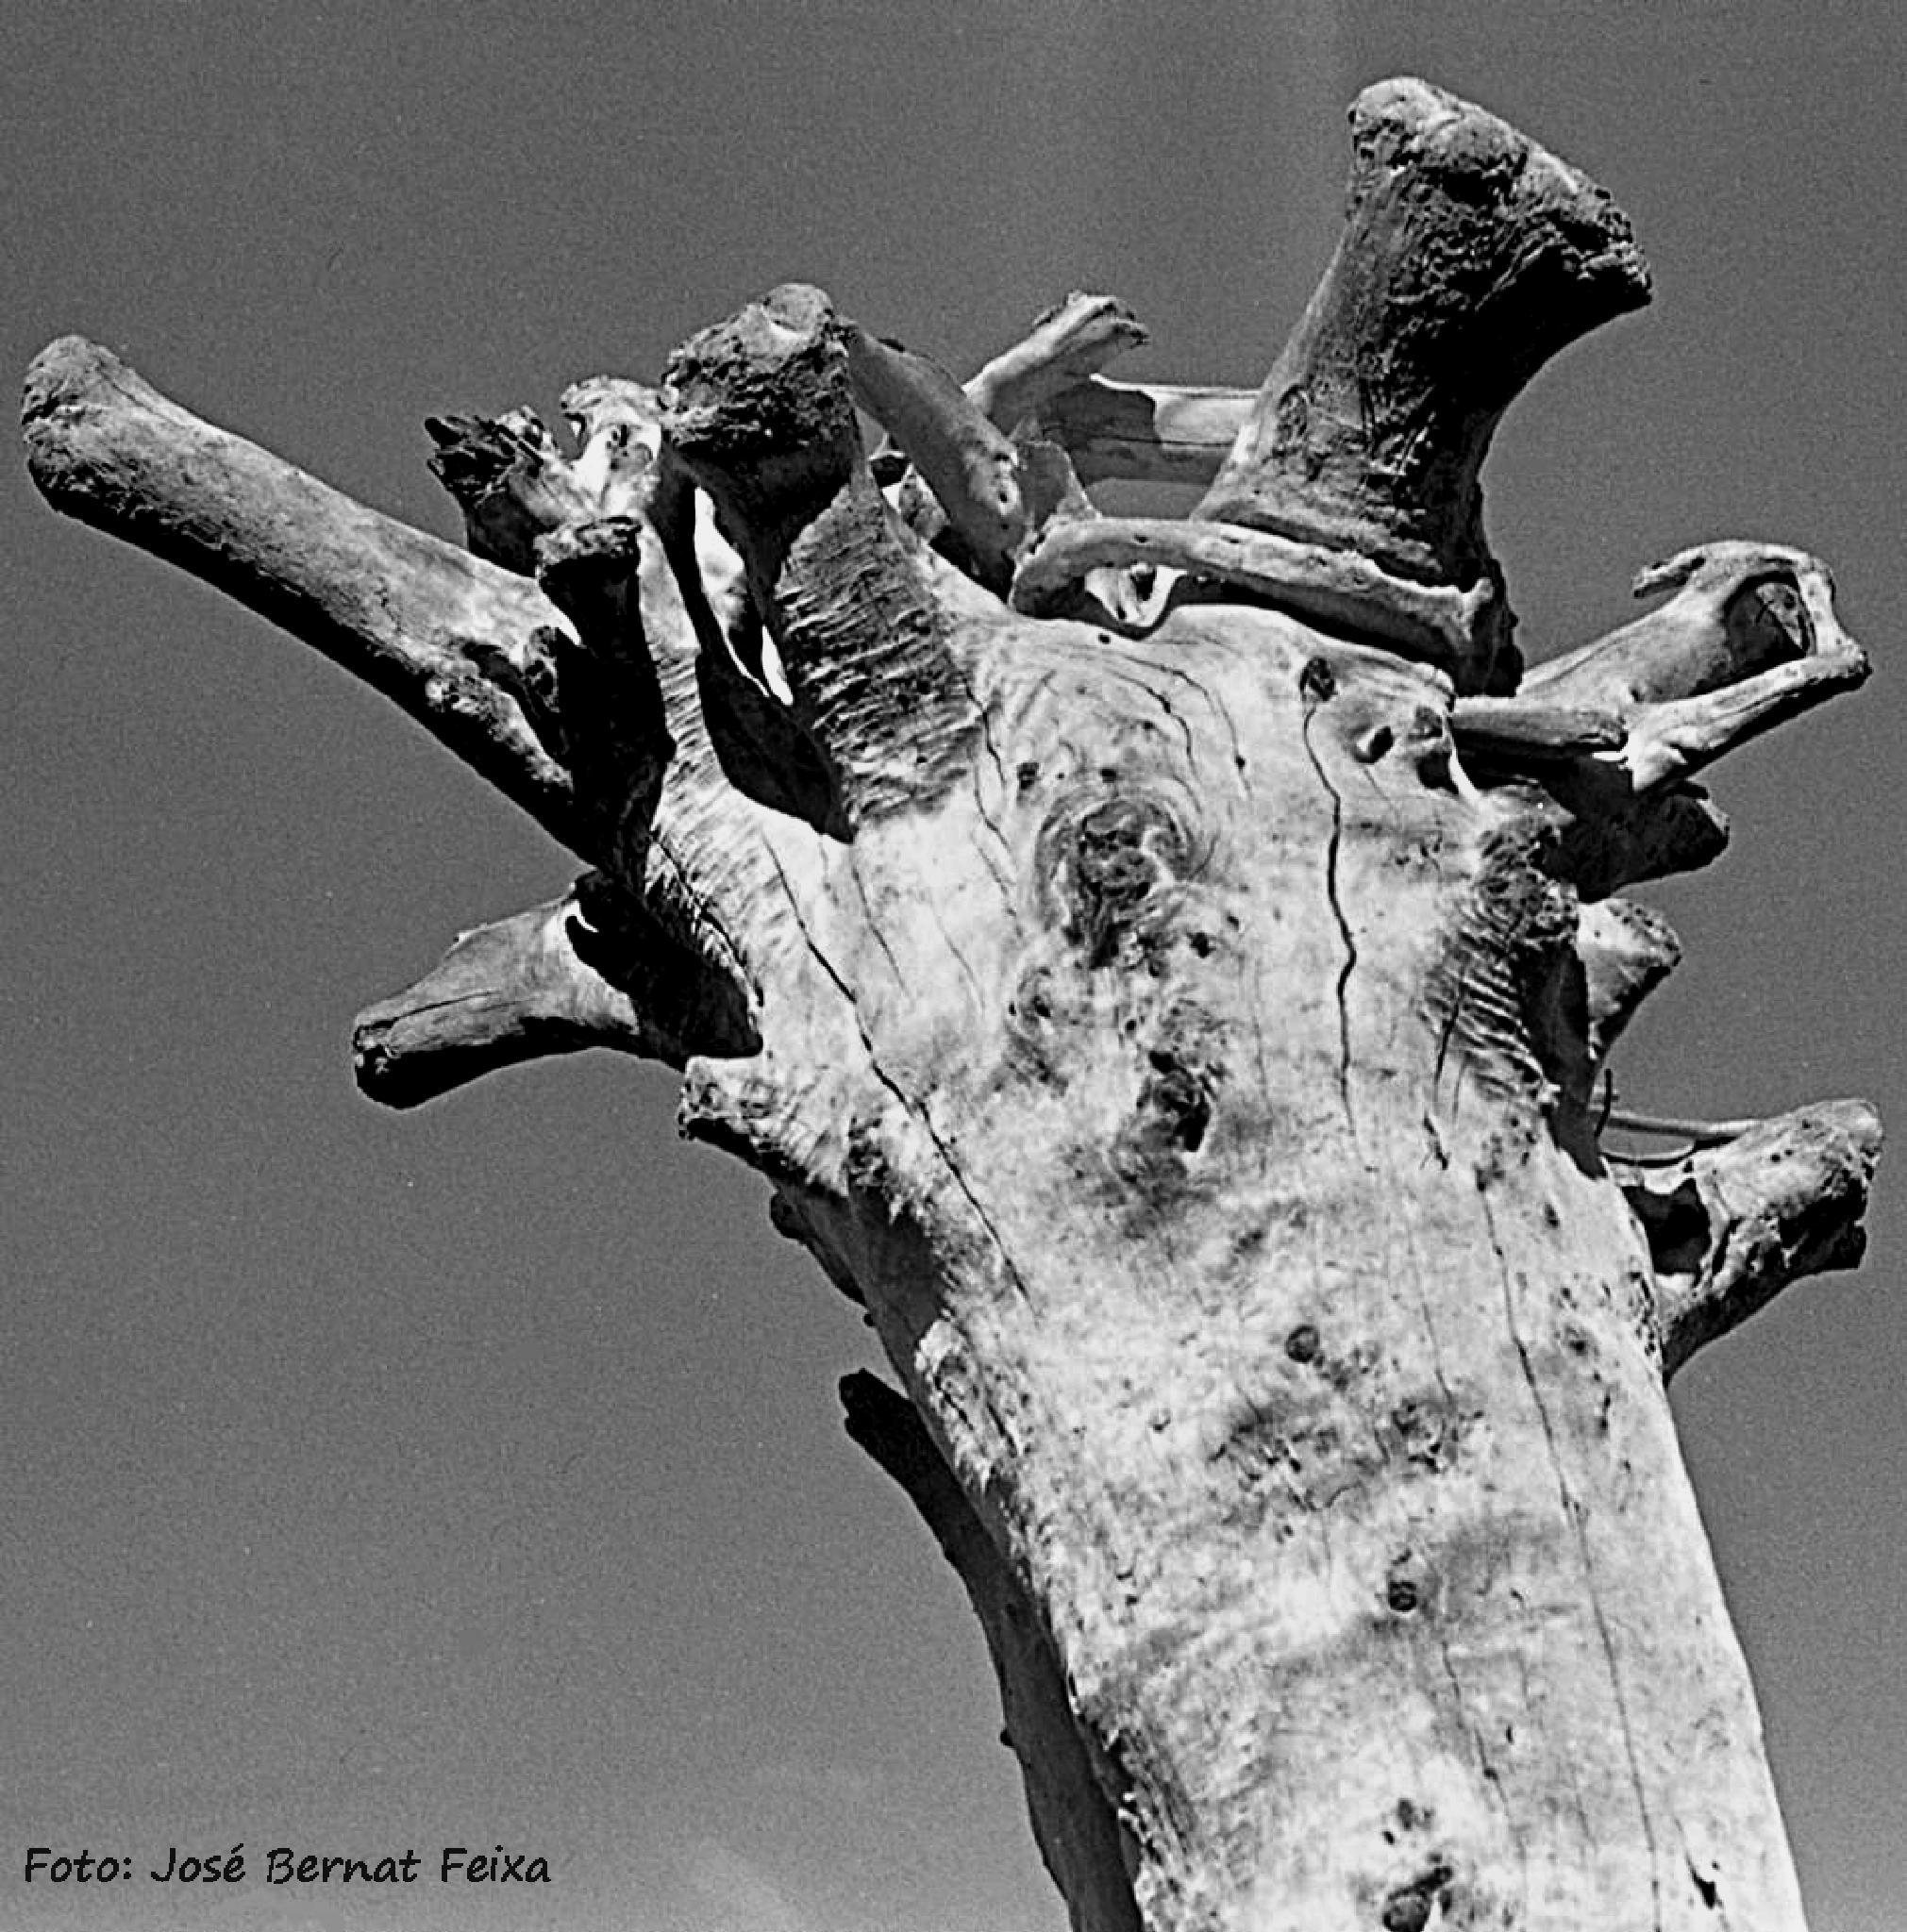 ÁRBOL, BOOM, TREE,  Tanger by José Bernat Feixa